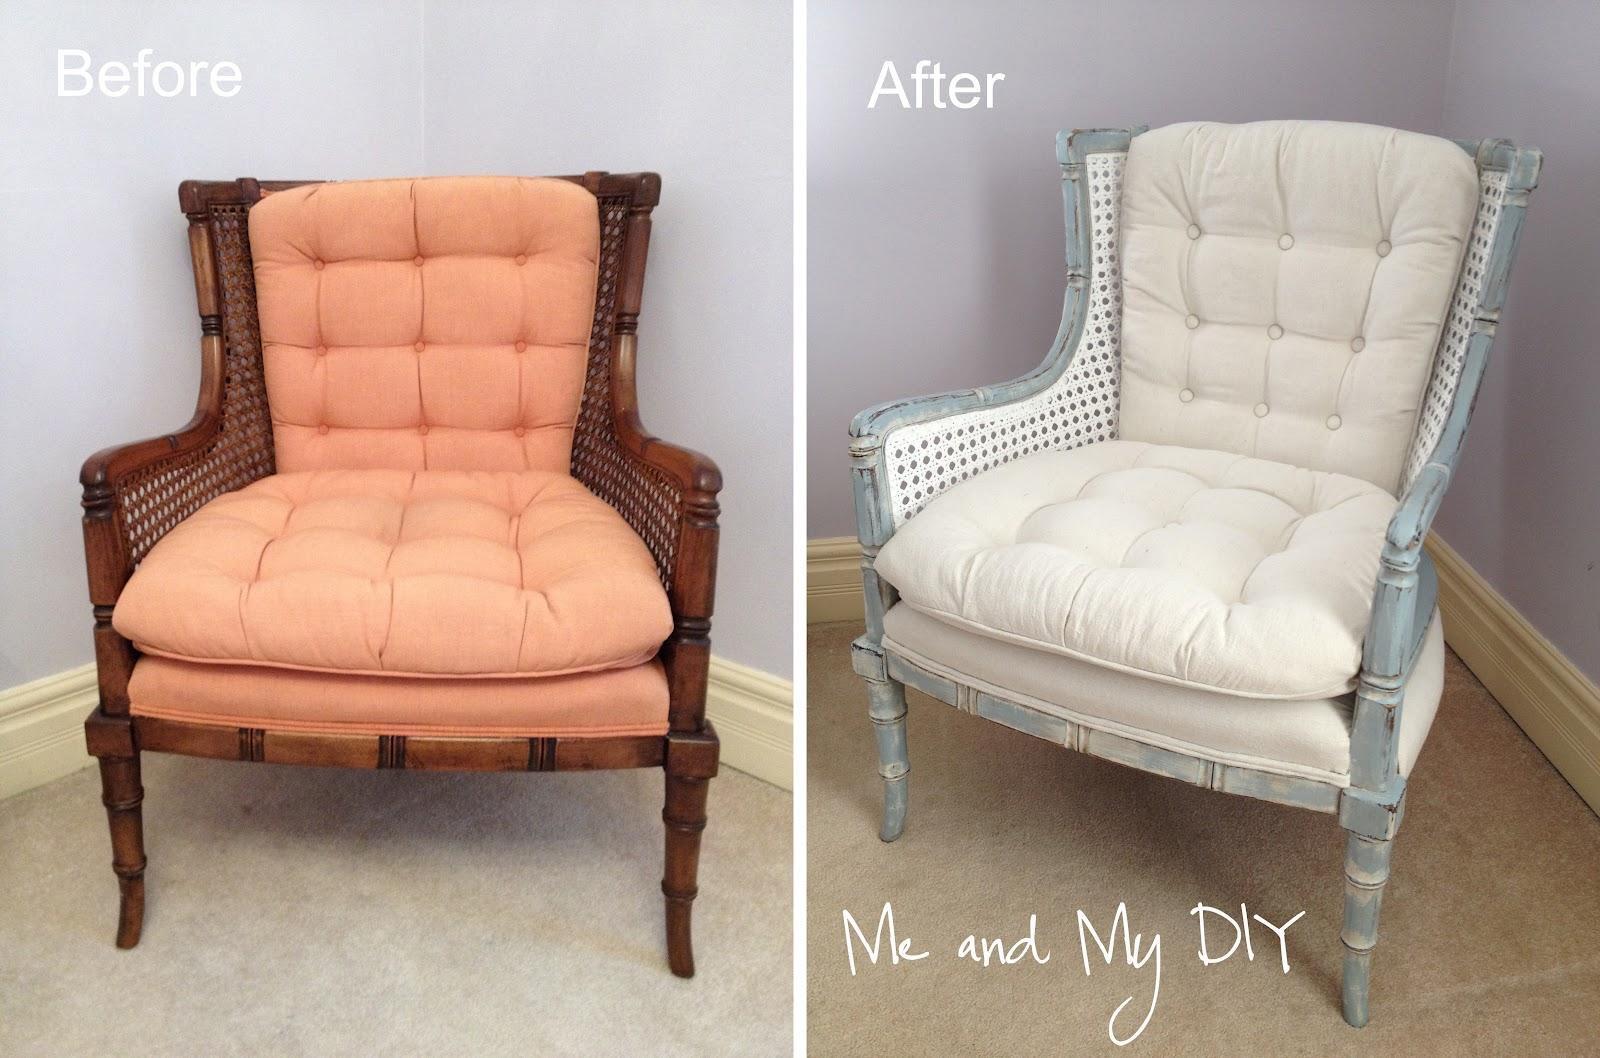 Cane chairs with cushions - Cane Chairs With Cushions 40